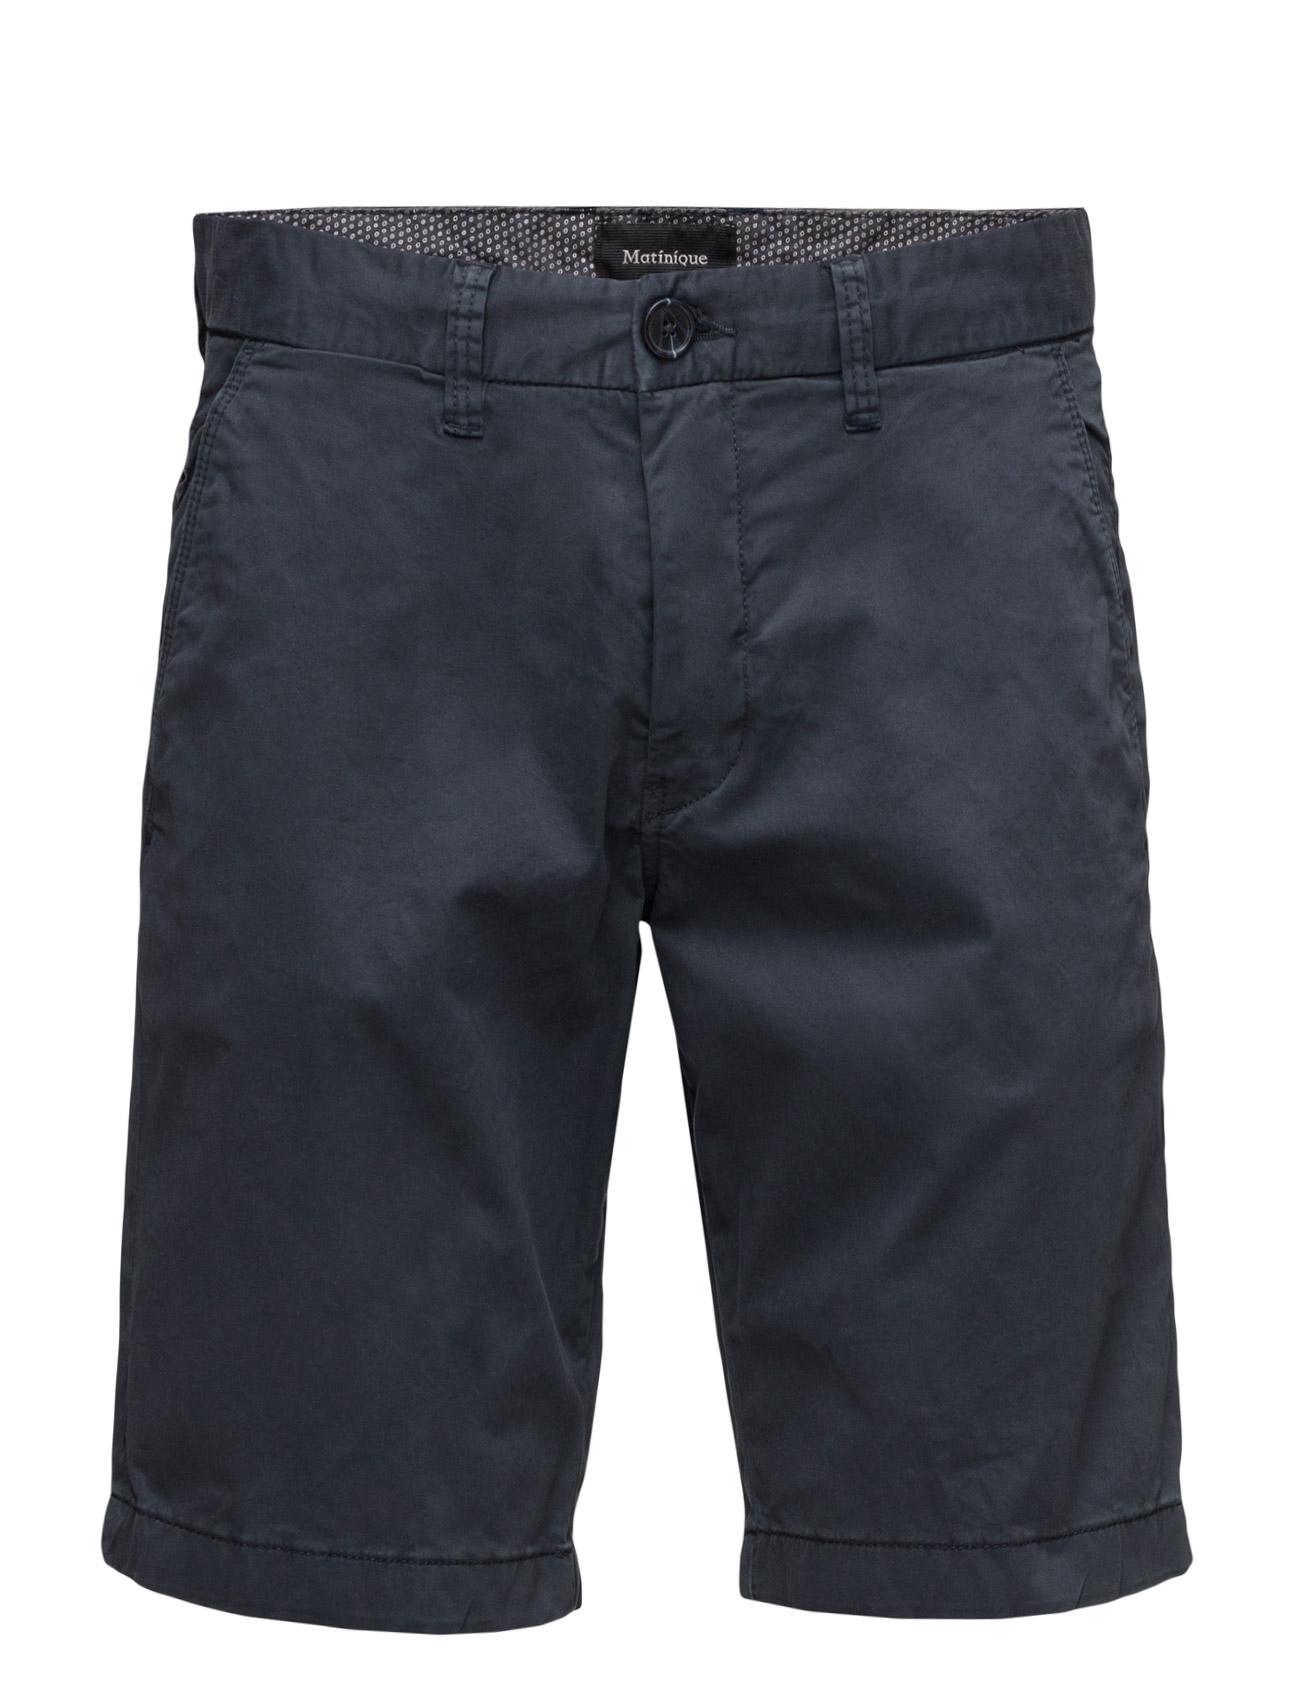 Megacoola Pristu Sh Matinique Bermuda Shorts till Män i trevliga ... f119382ec7aa1